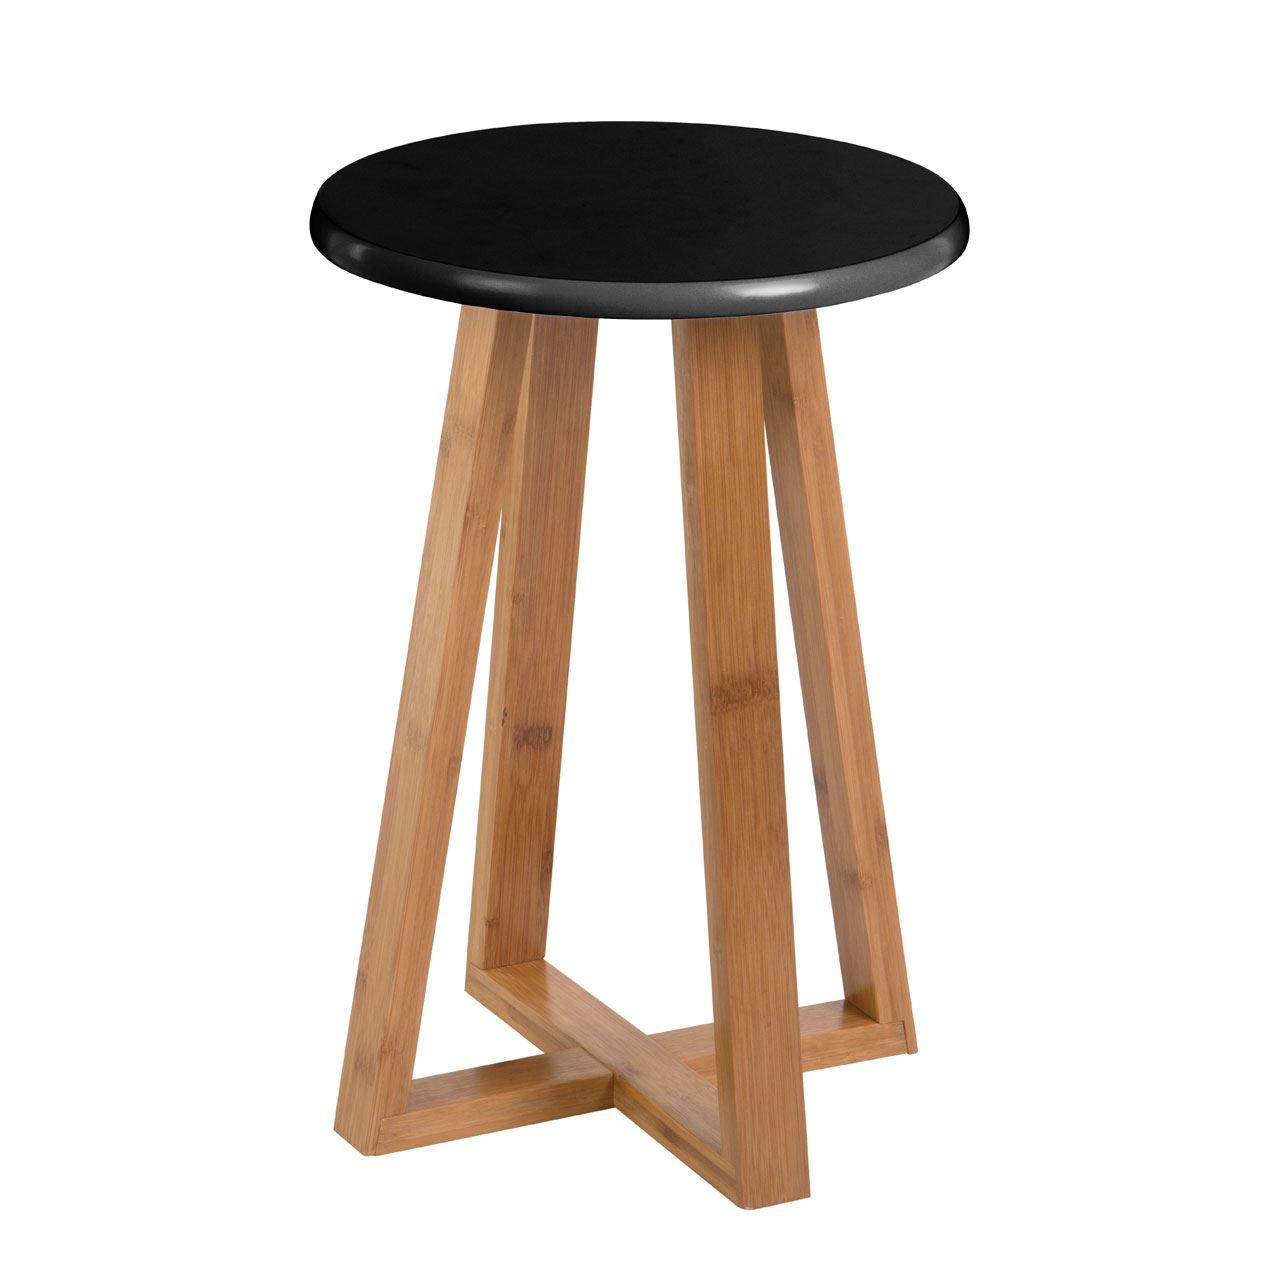 Viborg Round Stool Bamboo Wood Base Legs Breakfast Bar